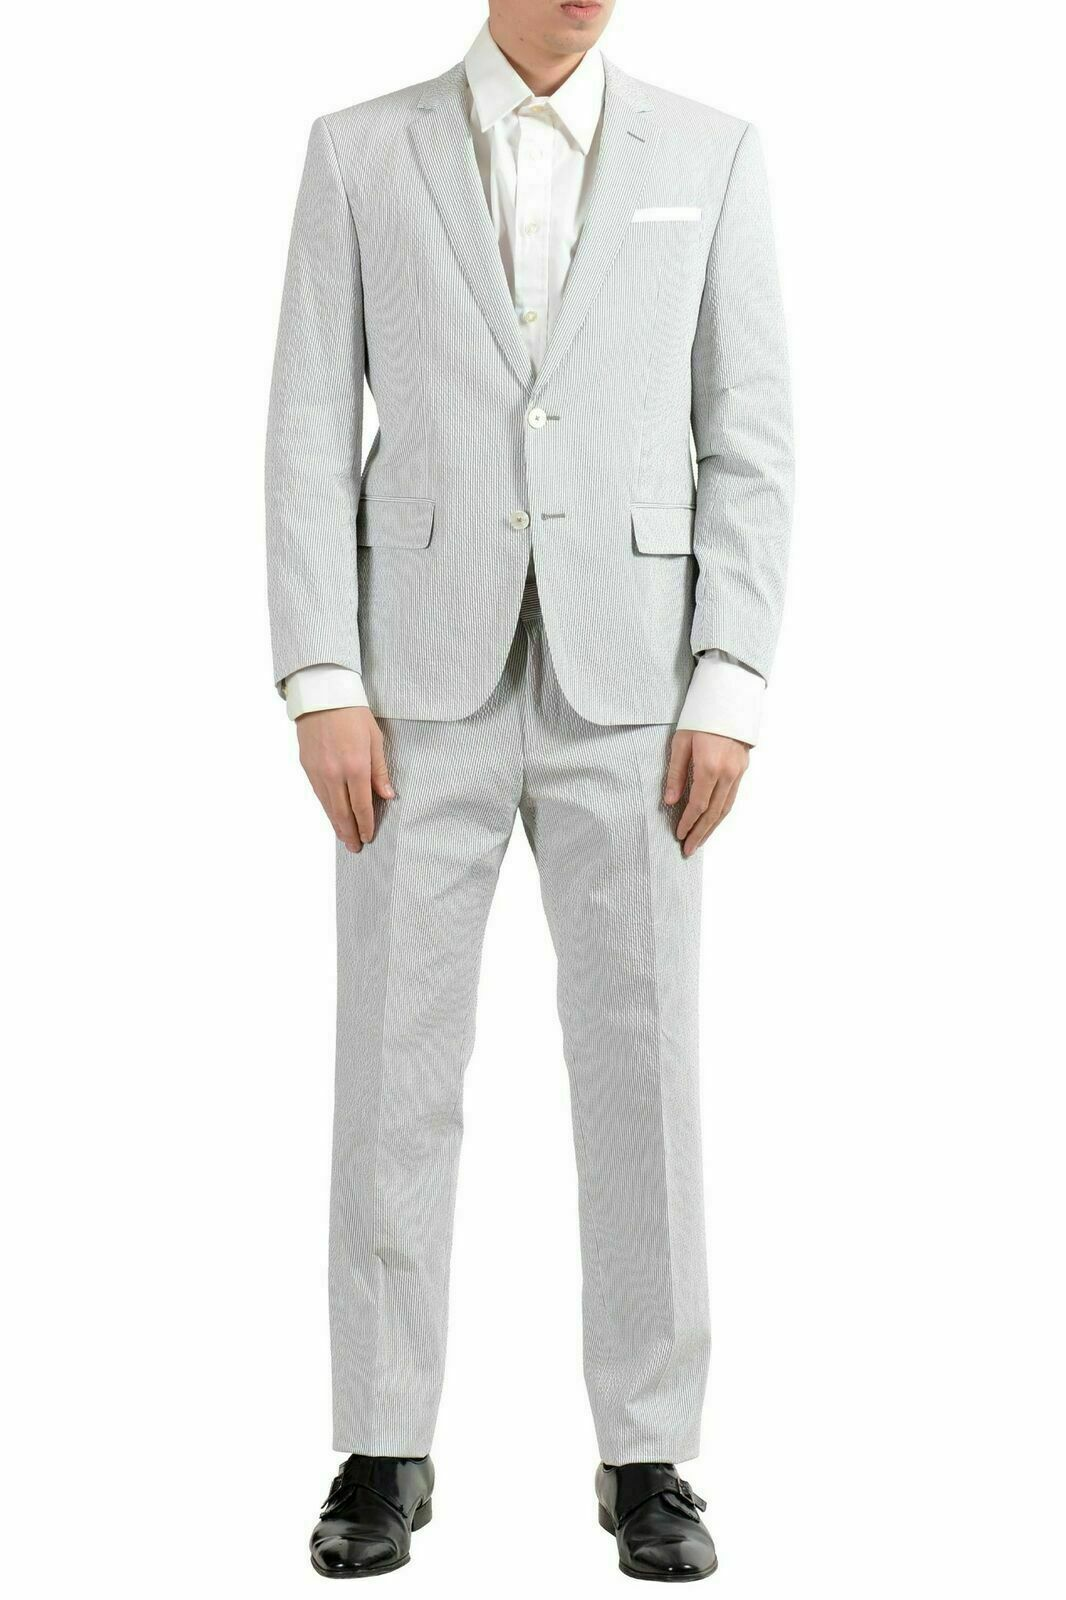 Hugo Boss  Hedson3 Gander1  Men's Striped Stretch Two Button Suit US 40S IT 50S